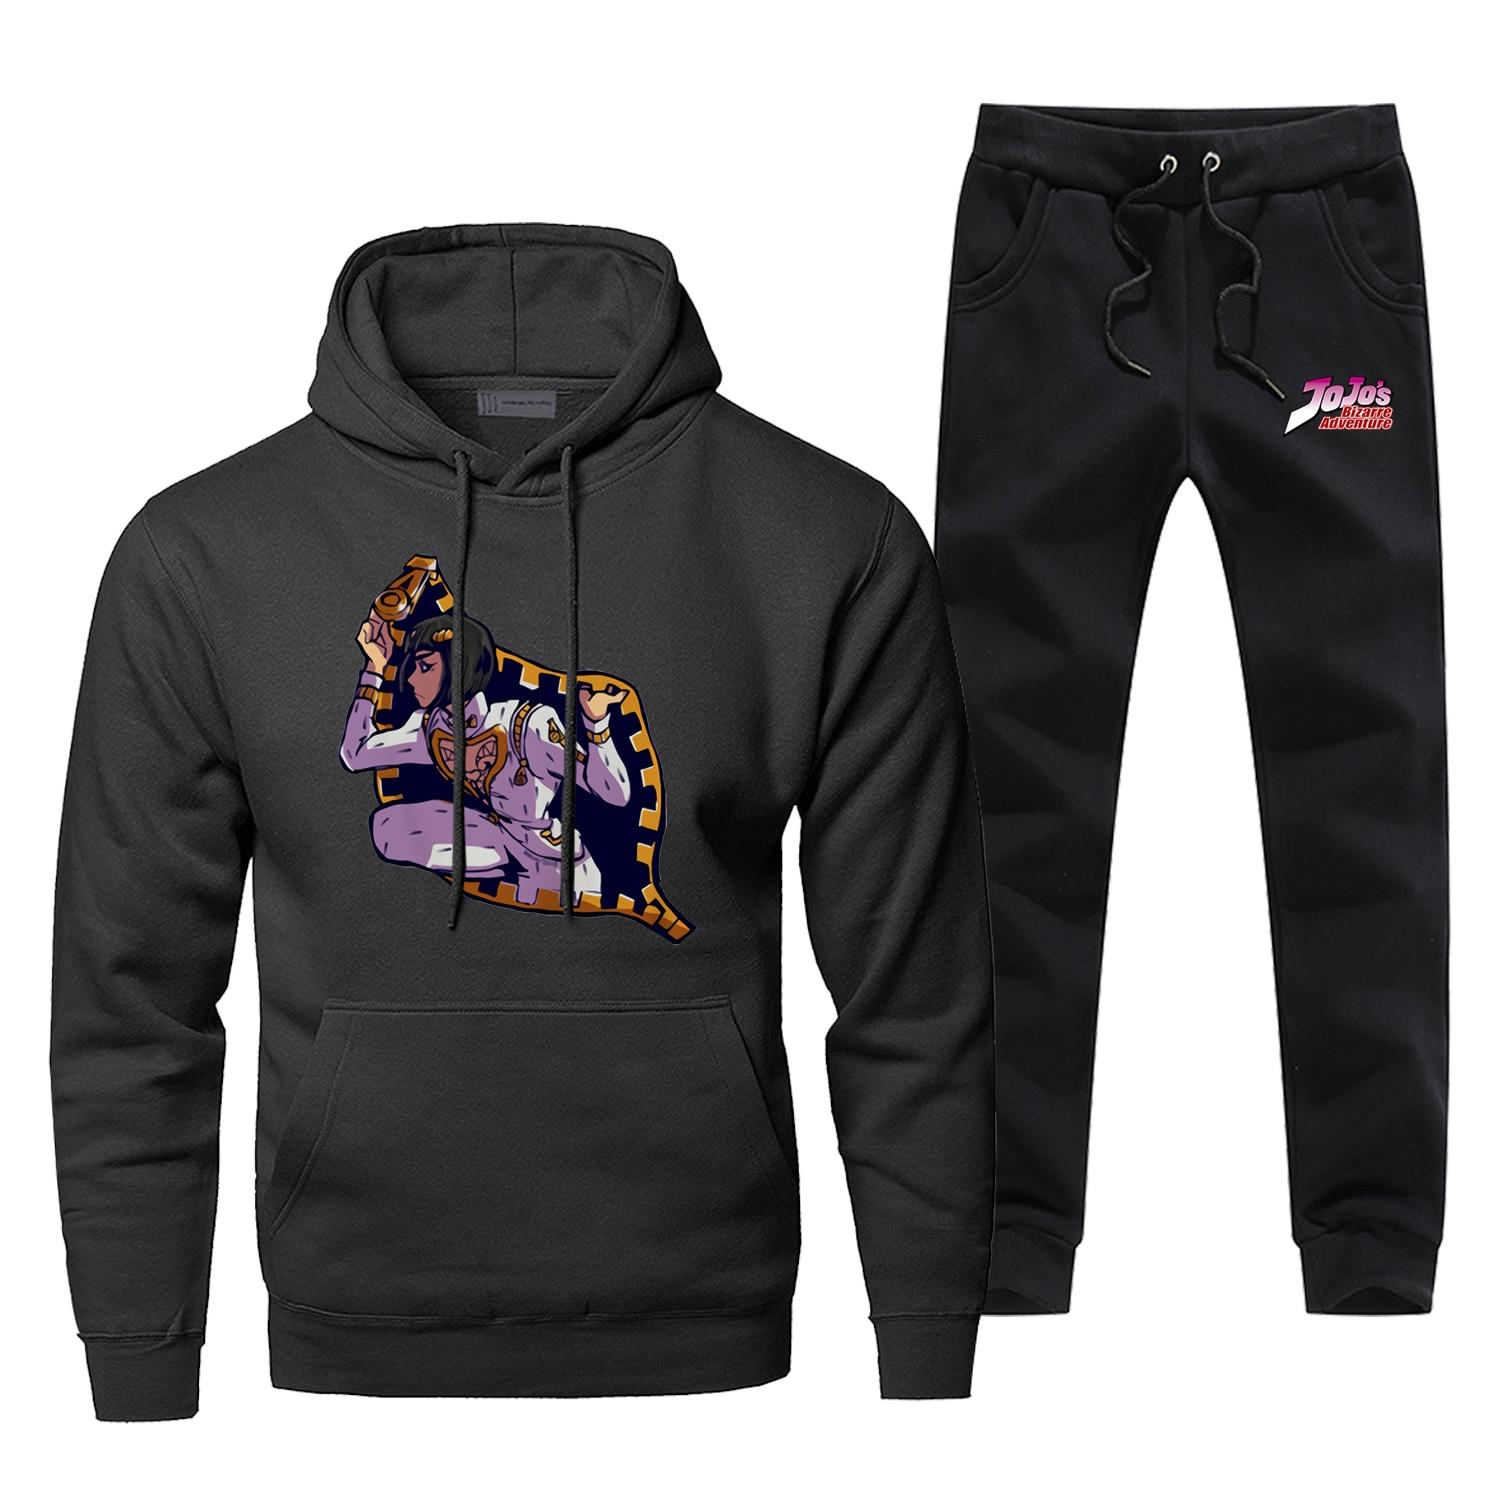 Jojo Bizarre Adventure Mens Hoodies Sets Two Piece Pant Hoodie Sweatshirt Sweatpants Streetwear Funny Science Male Sweatshirts